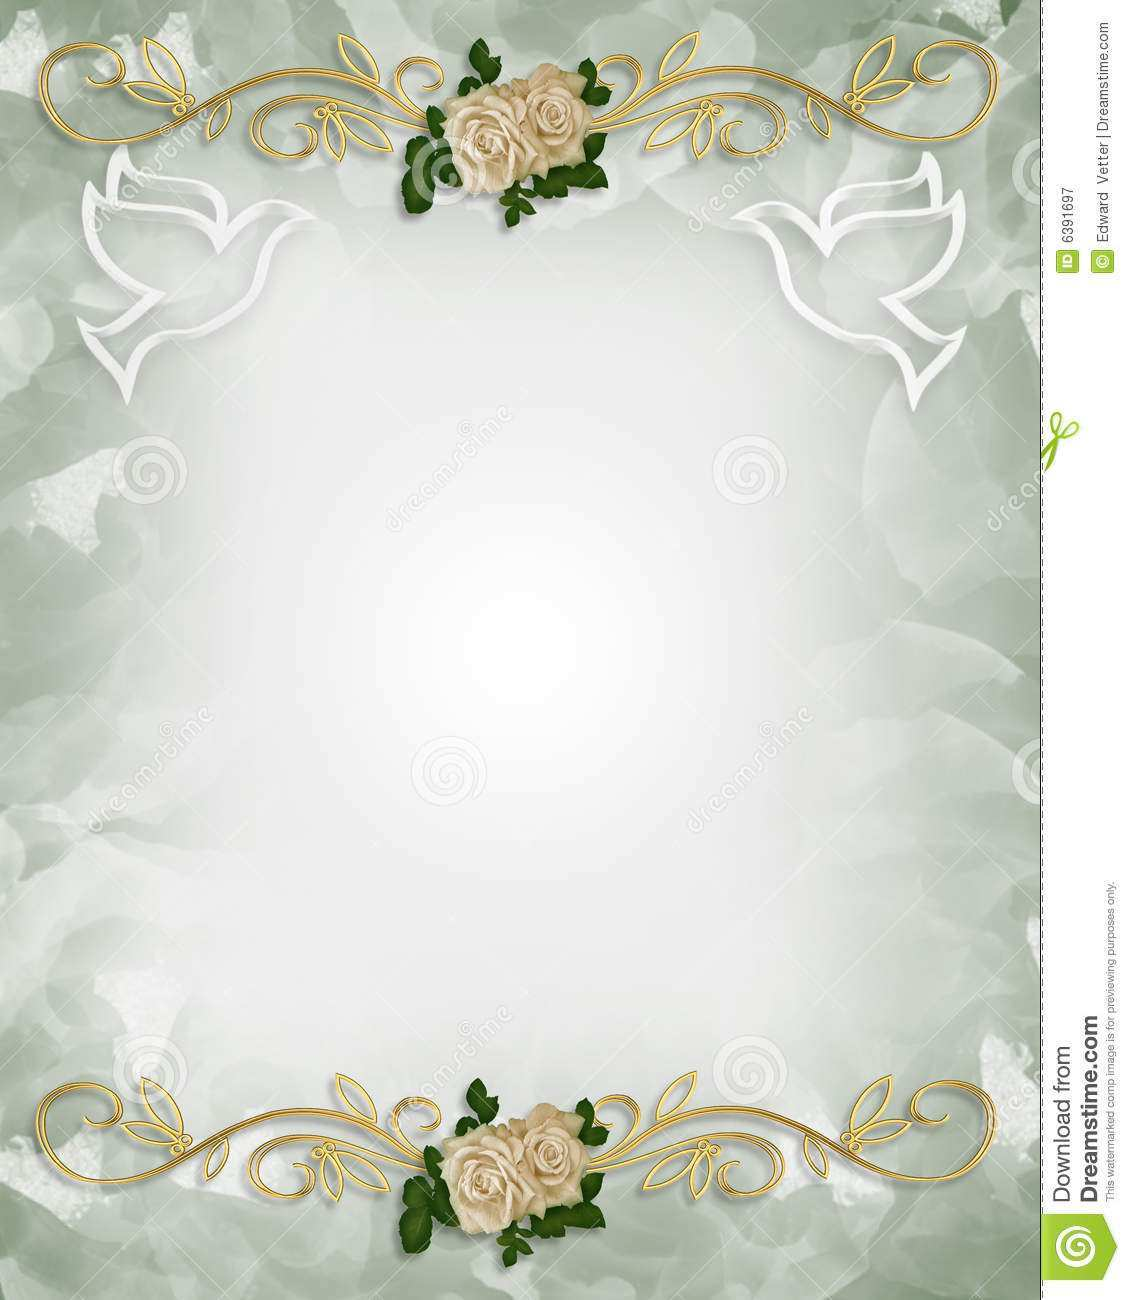 90 Visiting Wedding Invitation Template Background in Photoshop by Wedding Invitation Template Background